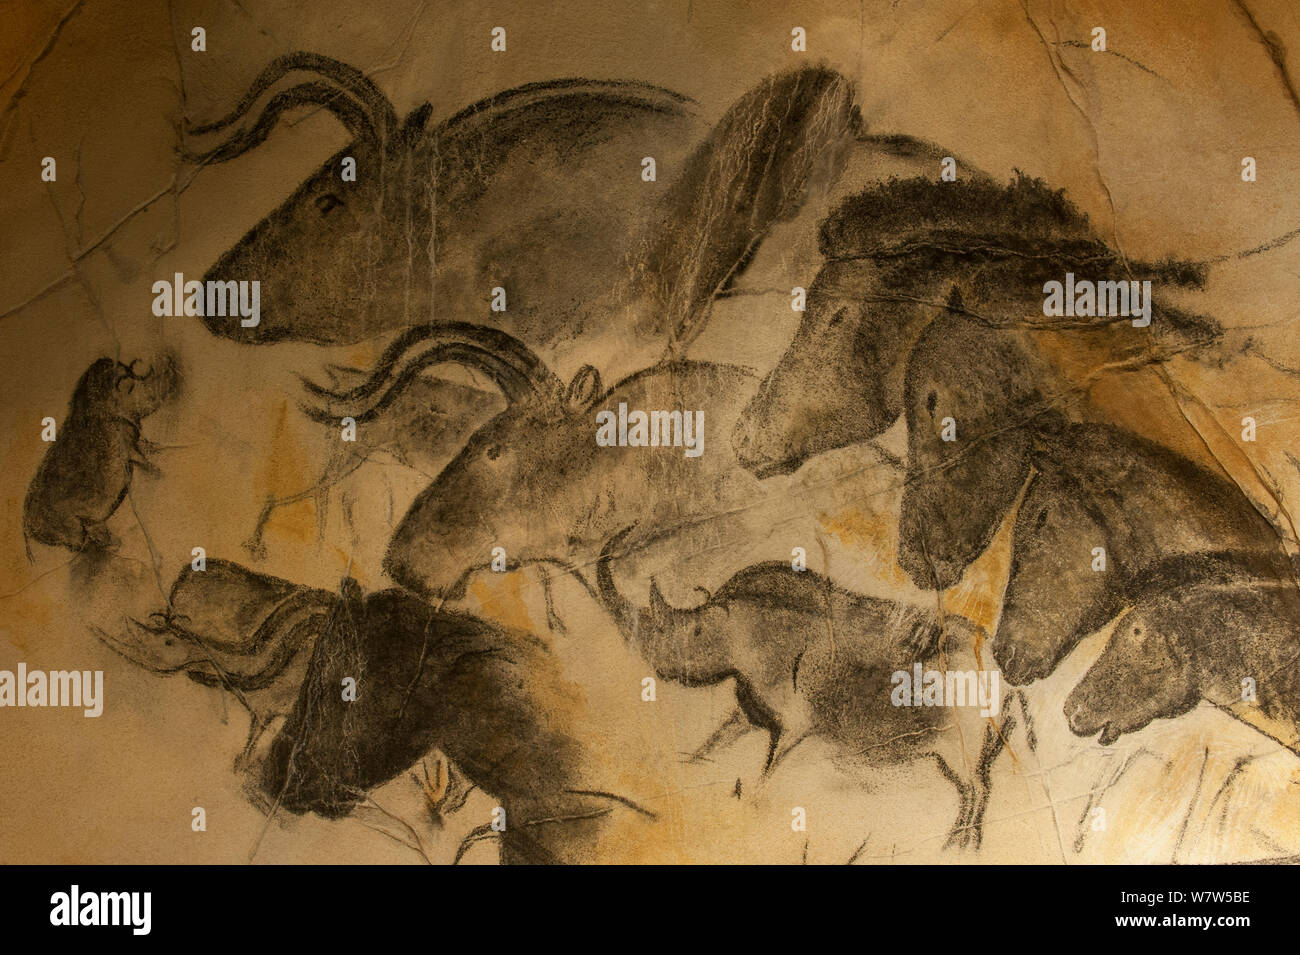 Replica Of Prehistoric Rock Paintings In Chauvet Cave Showing Woolly Rhinoceros Coelodonta Antiquitatis Wild Horses Equus Ferus And Auroch Bulls Bos Primigenius Chauvet Pont D Arc Cave Ardeche France Stock Photo Alamy